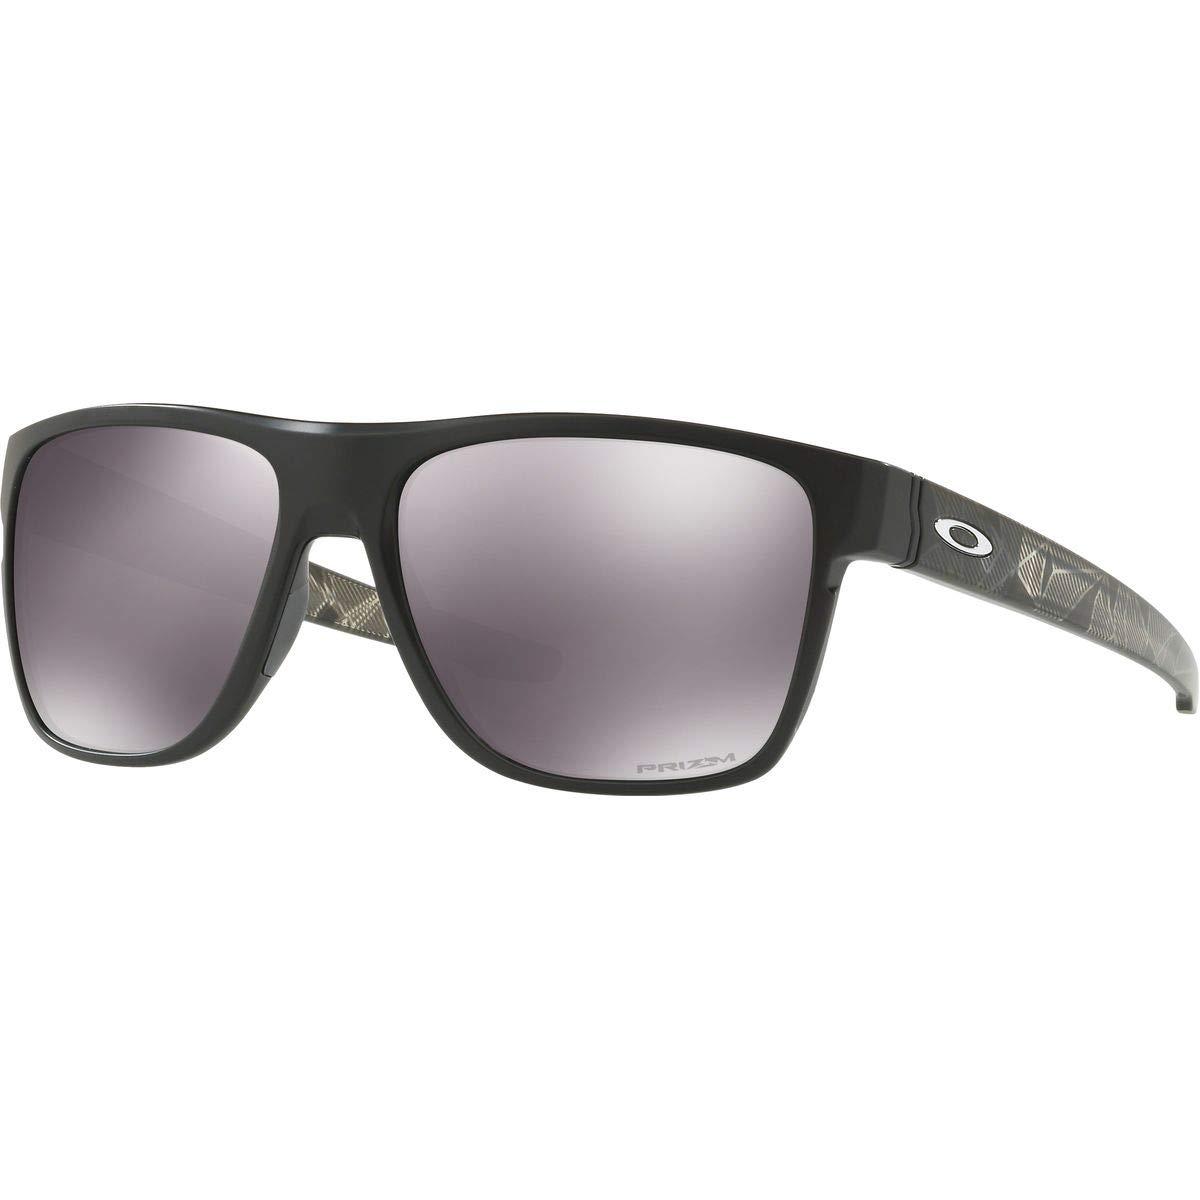 2a78255718aee Amazon.com  Oakley Men s Crossrange XL Iridium Square Sunglasses Polished  black 58.04 mm  Oakley  Clothing